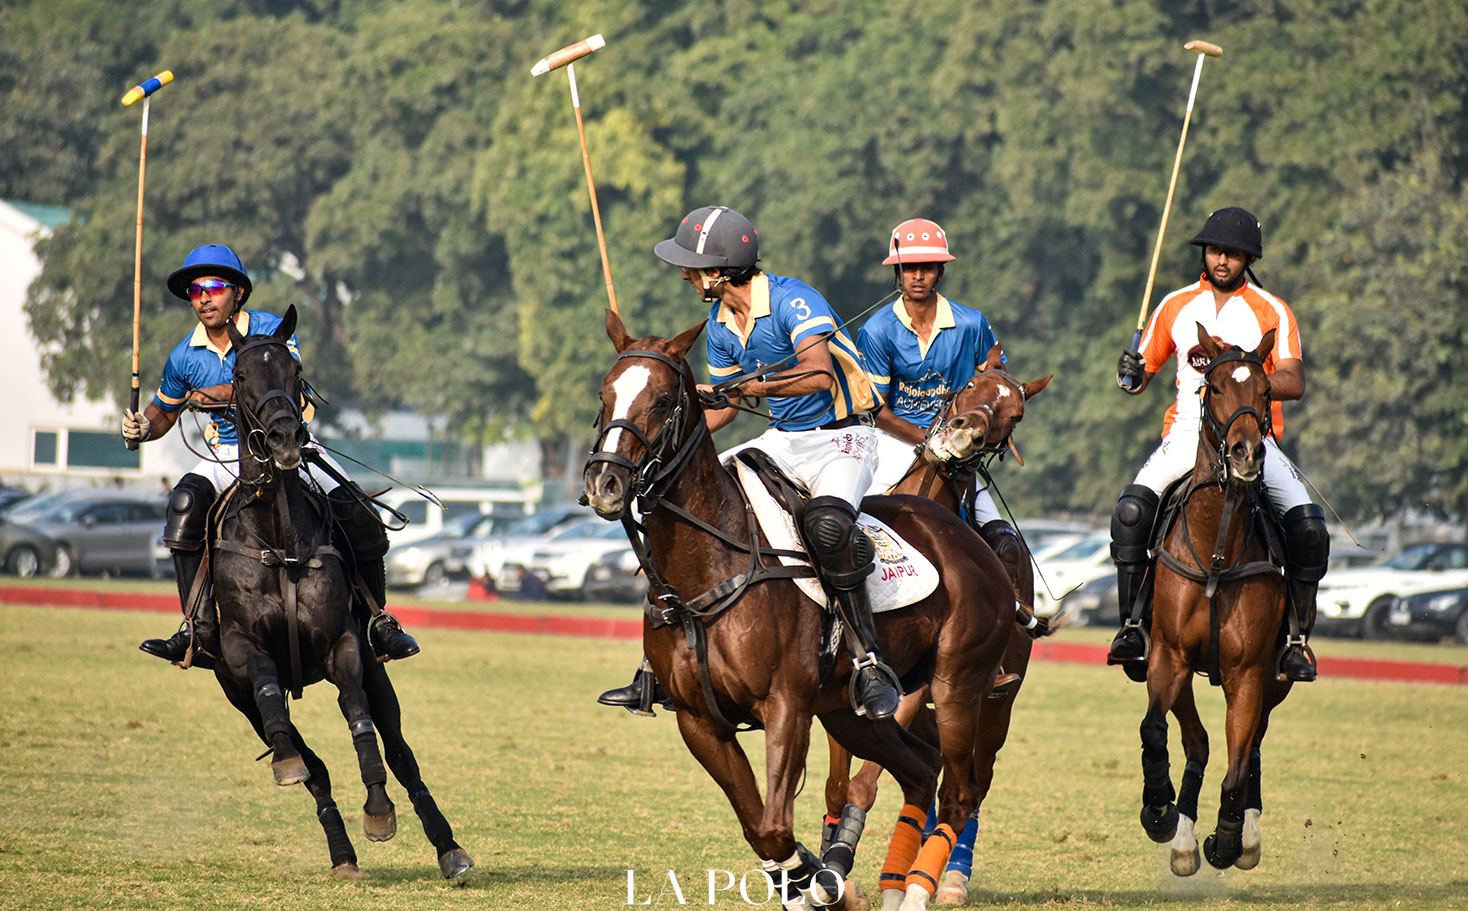 padmanabh-singh-of-jaipur-playing-polo-lapolo